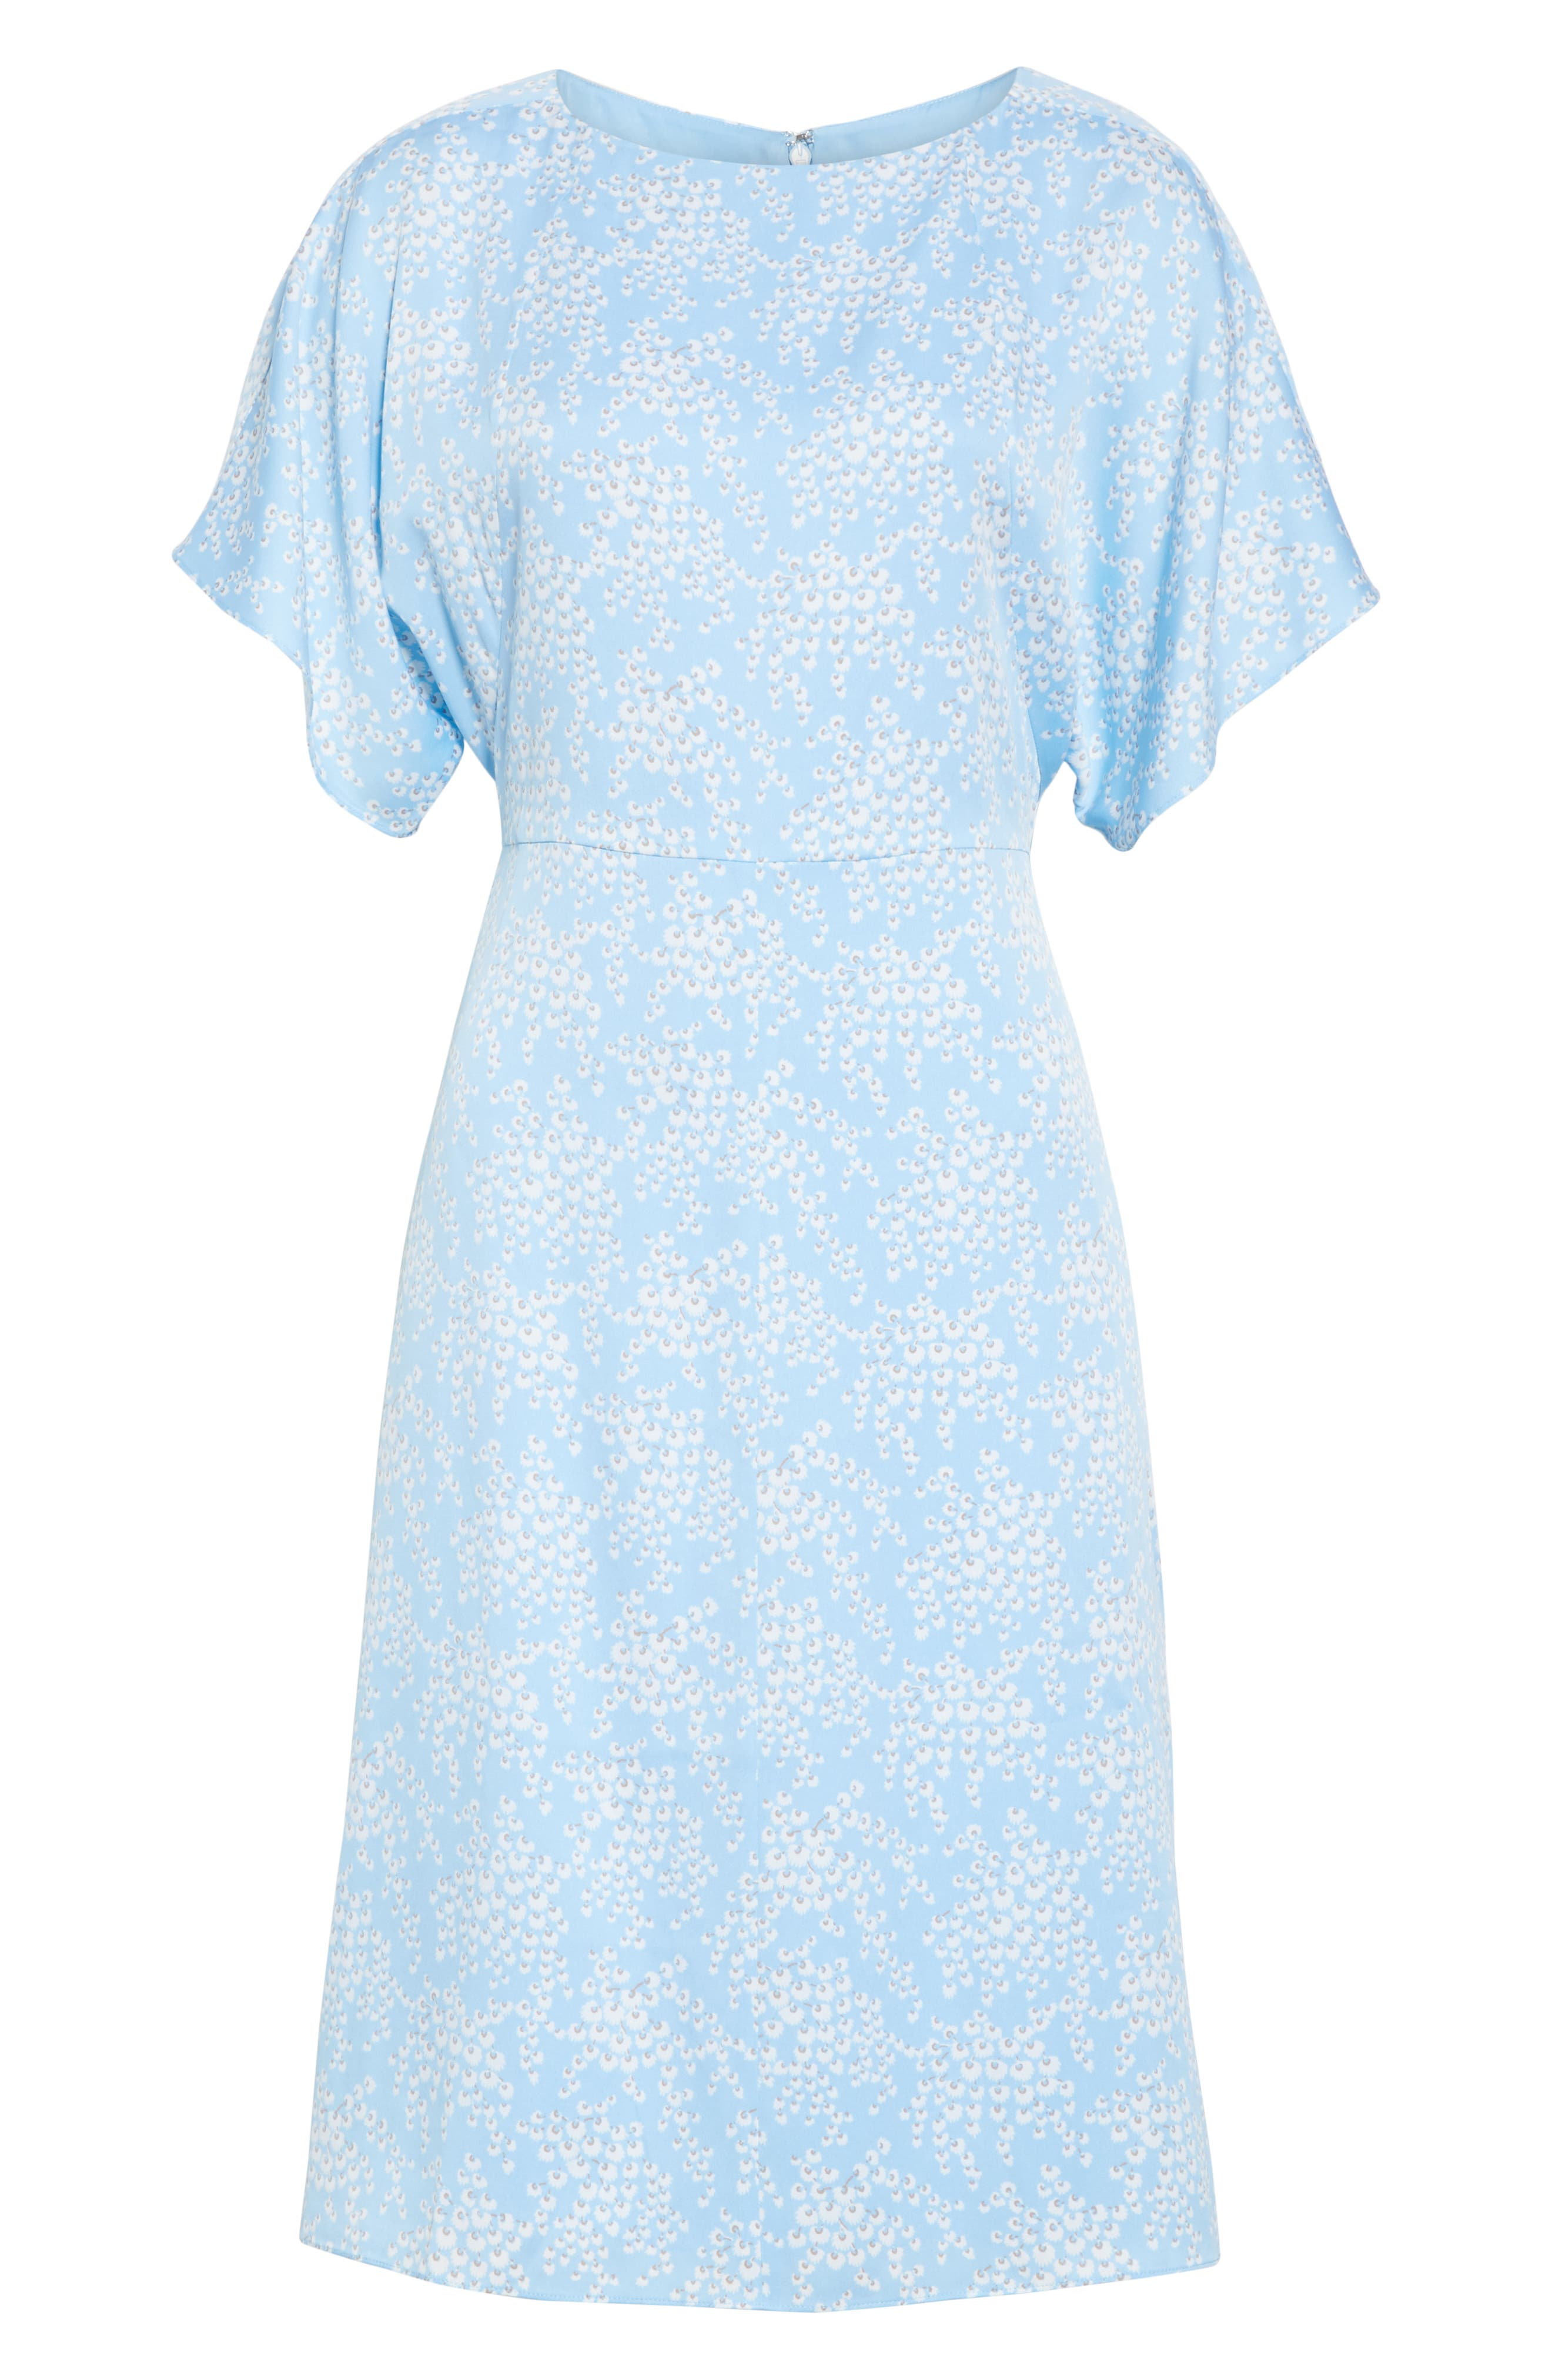 LEWIT, Kimono Sleeve Stretch Silk Dress, Alternate thumbnail 7, color, BLUE SIDDAL FLORAL